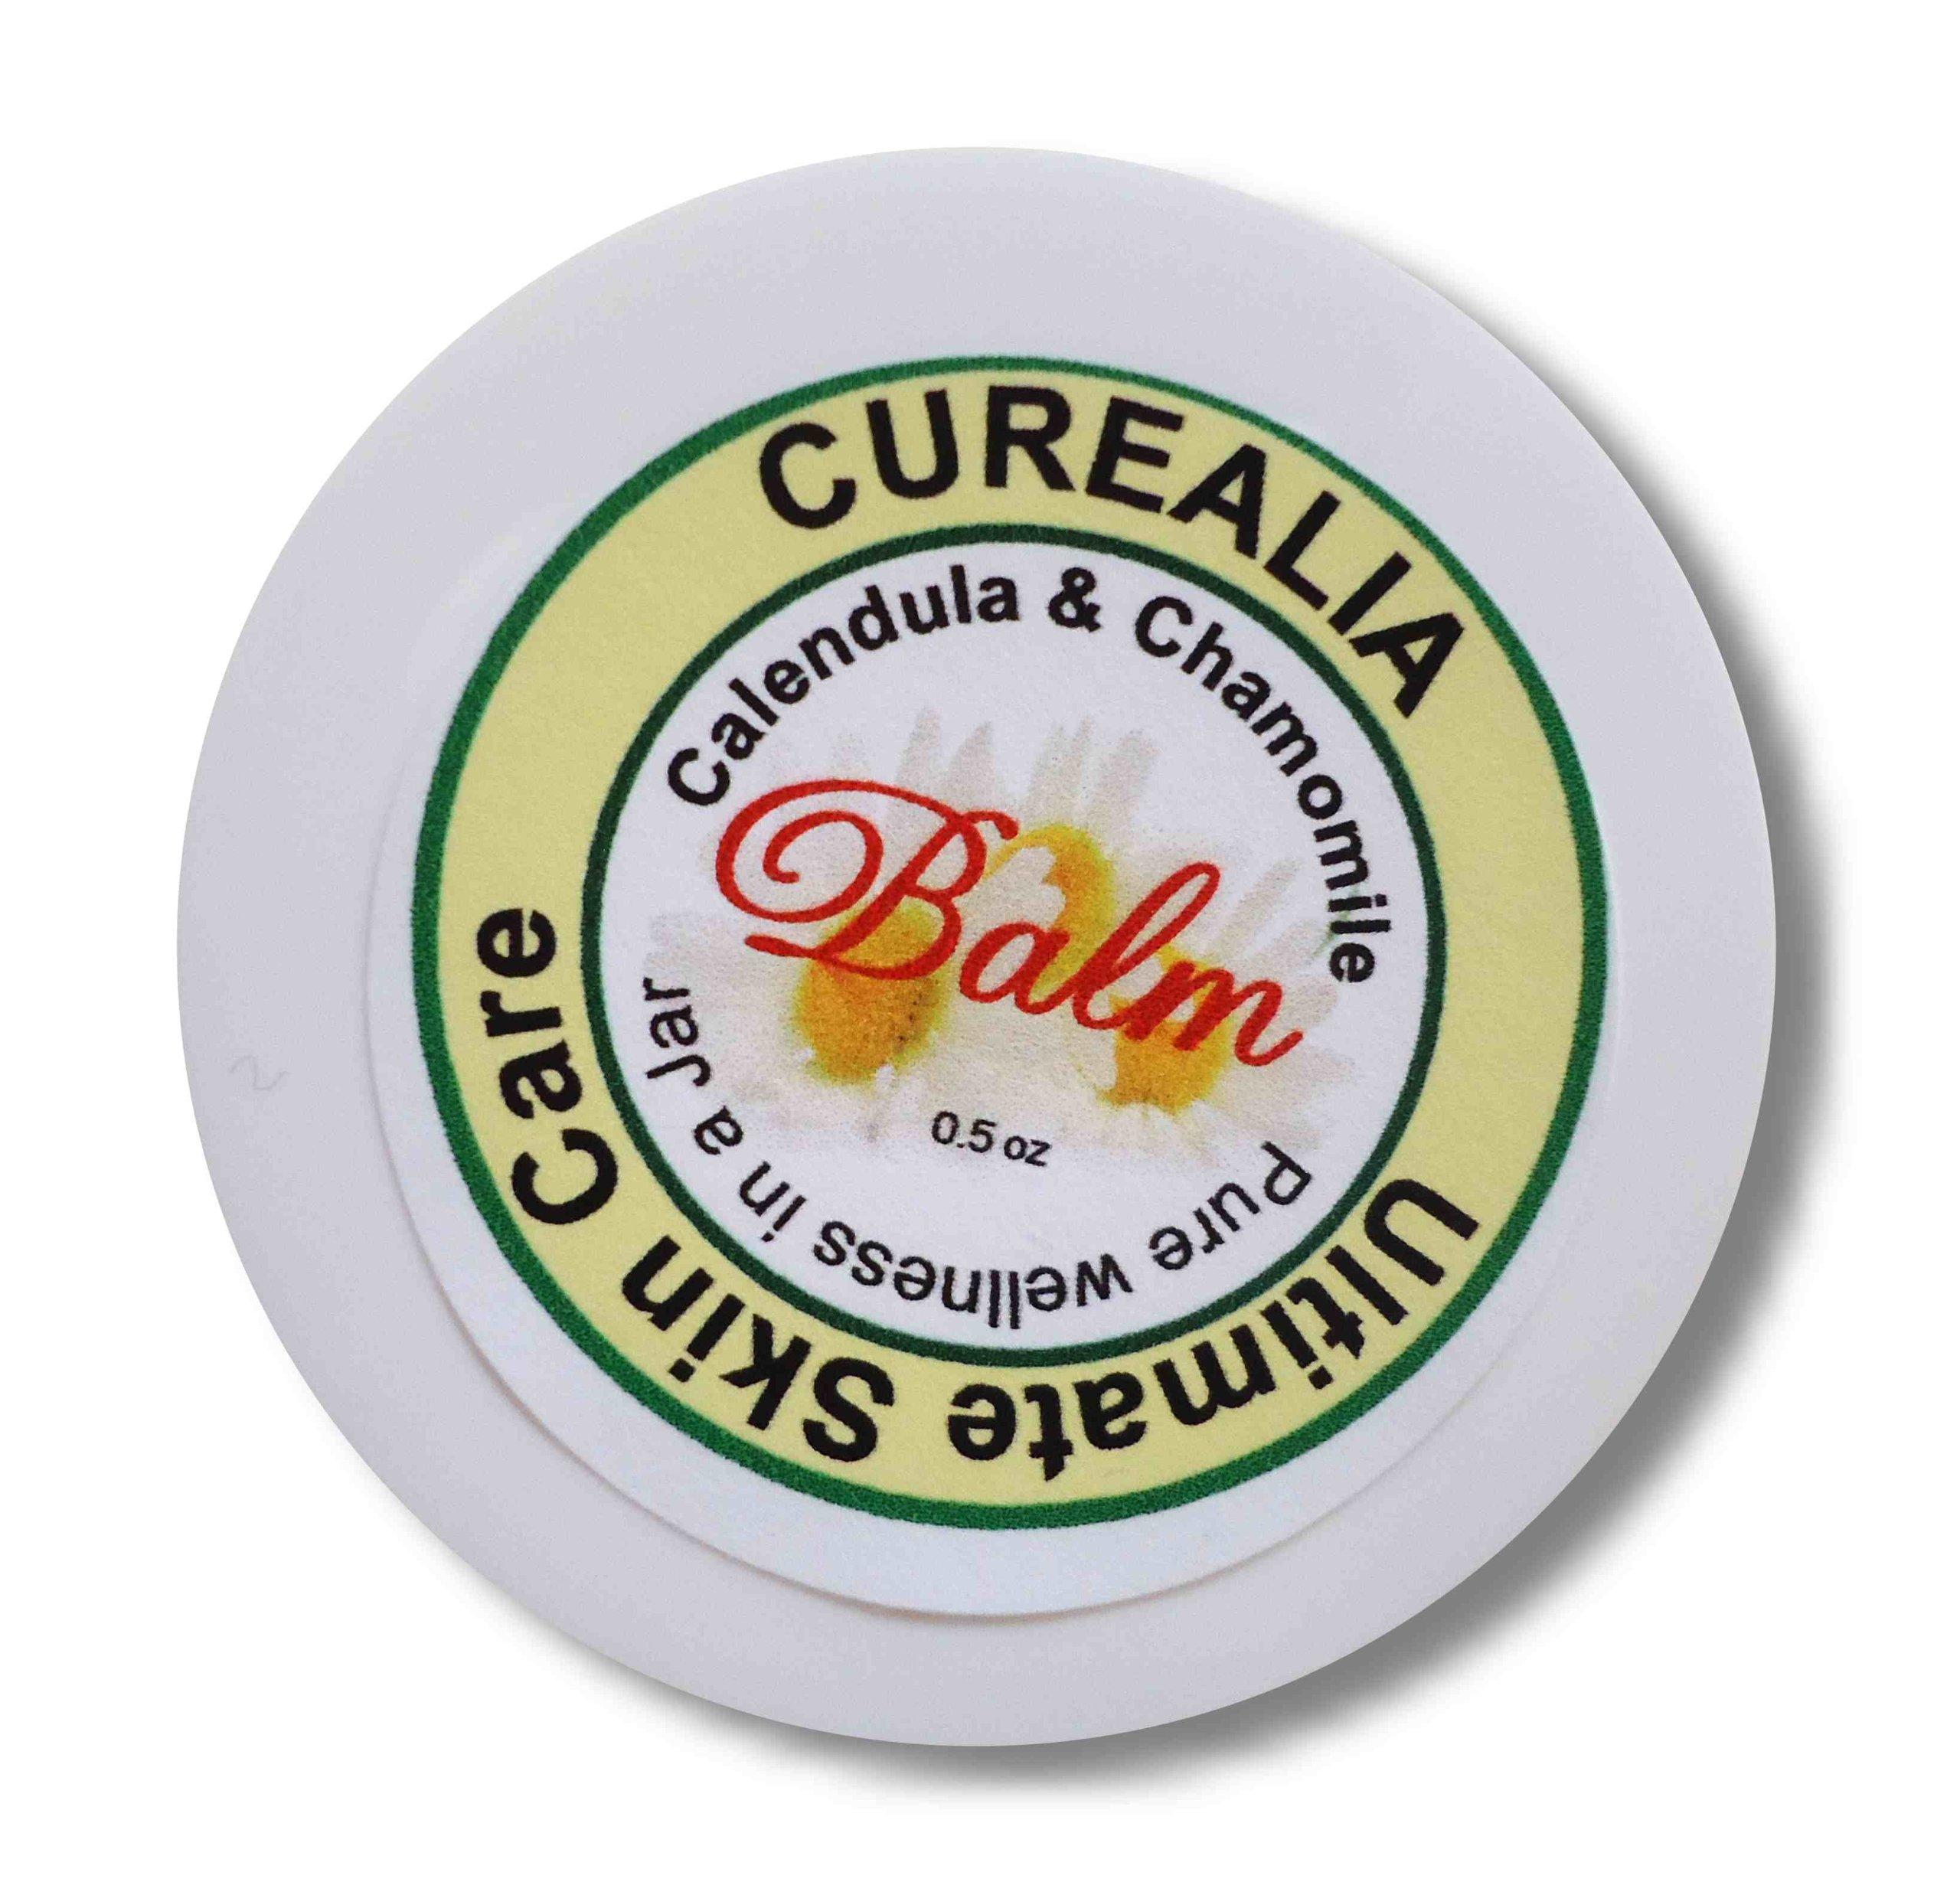 Ultimate Skin Care Balm - All Natural, Calendula, Chamomile - Chemicals Free 0.5 oz